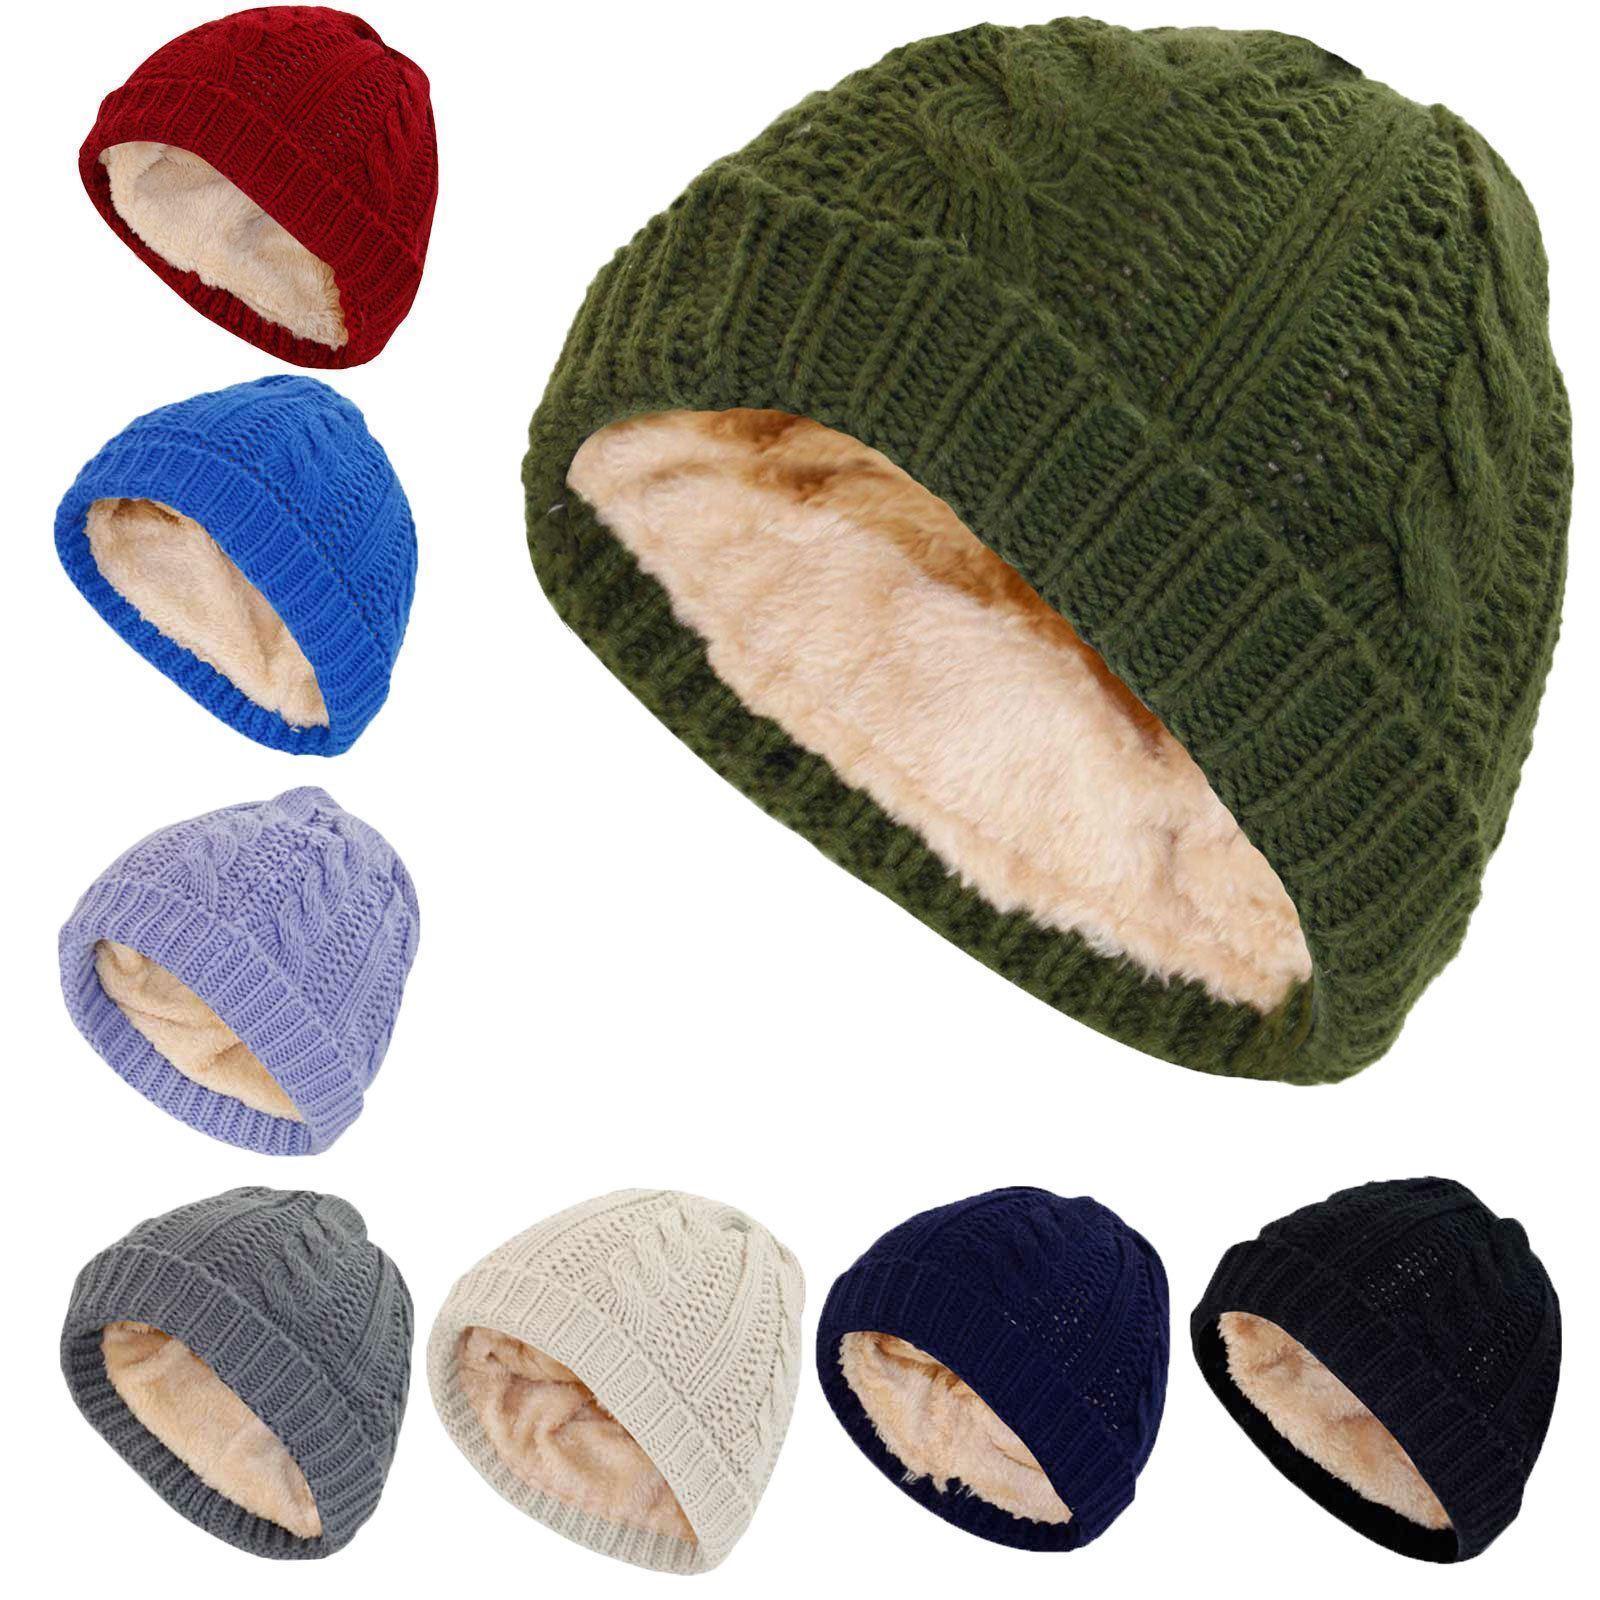 49638299e3a Details about Ladies Kids Cable Knit Sherpa Fleece Lined Women Cap Winter  Warm Heat Casual Hat